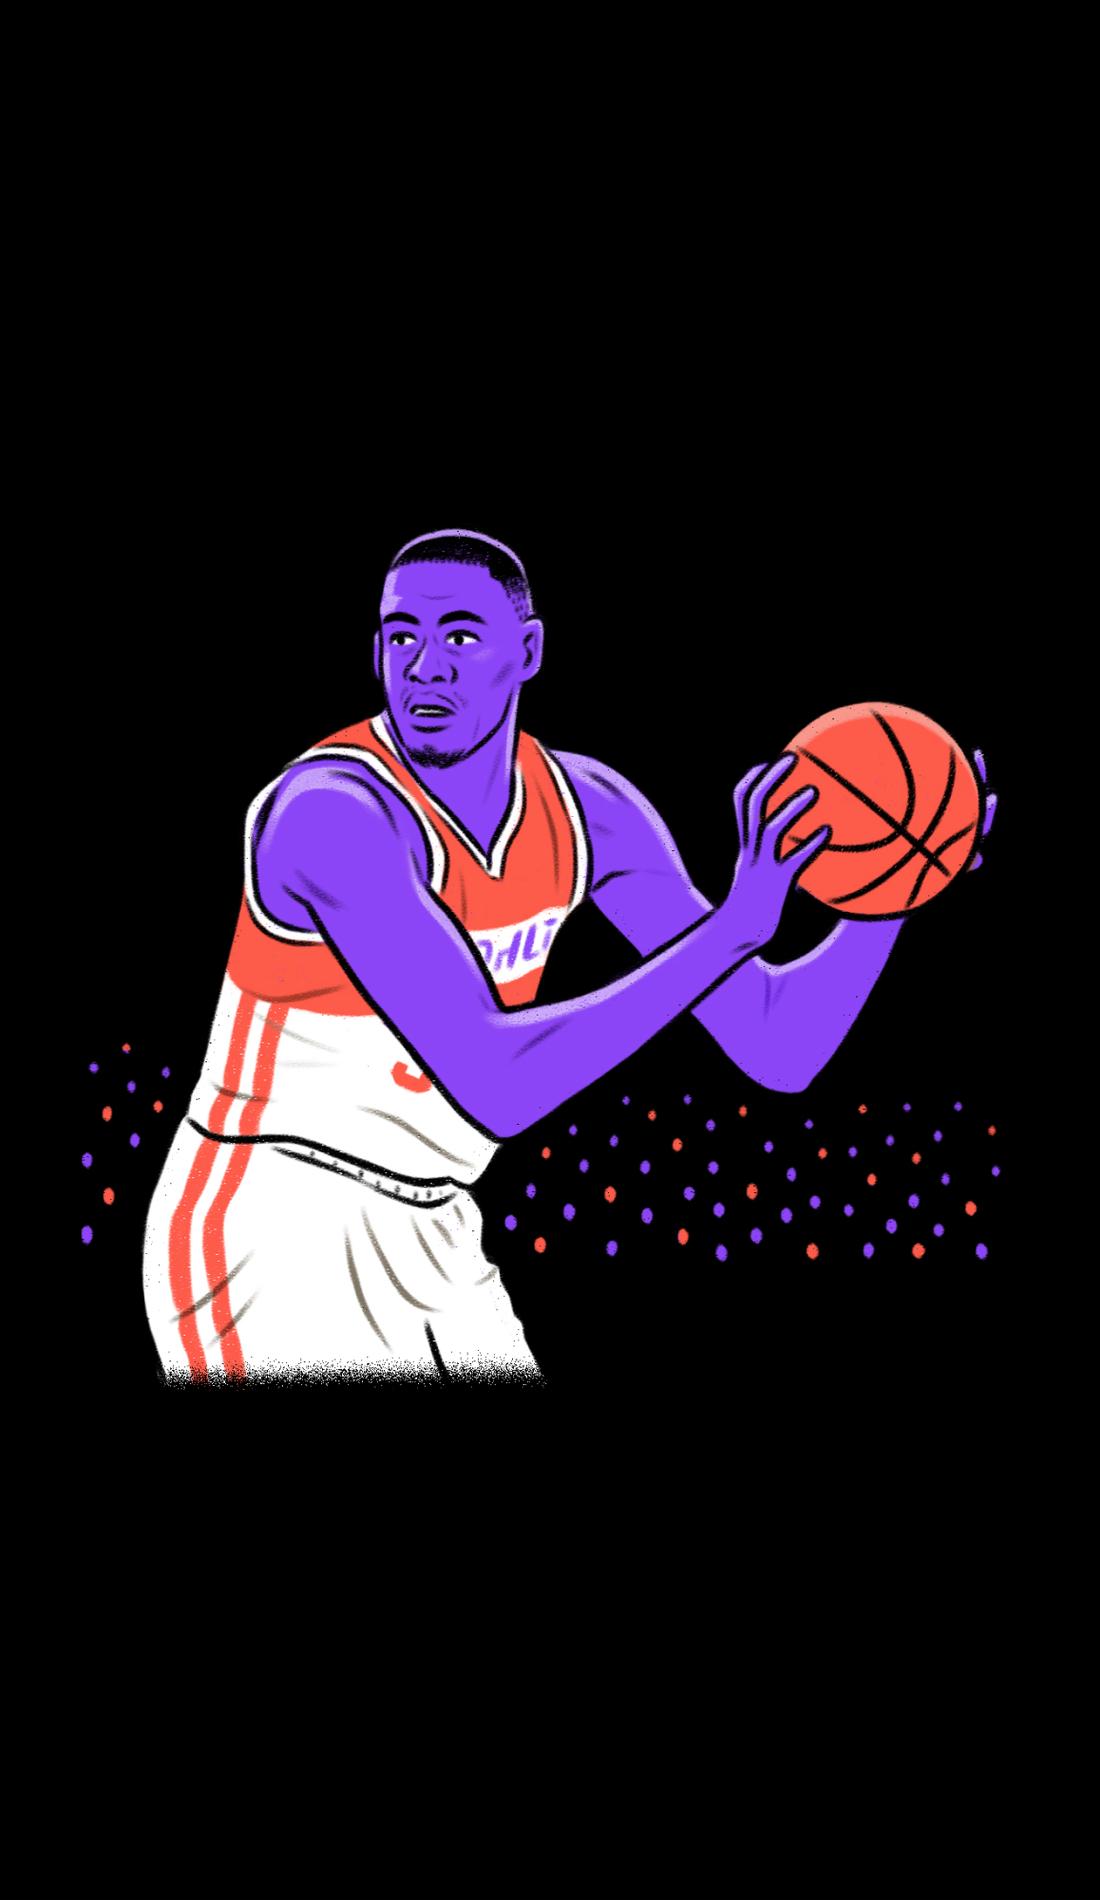 A Arizona State Sun Devils Basketball live event